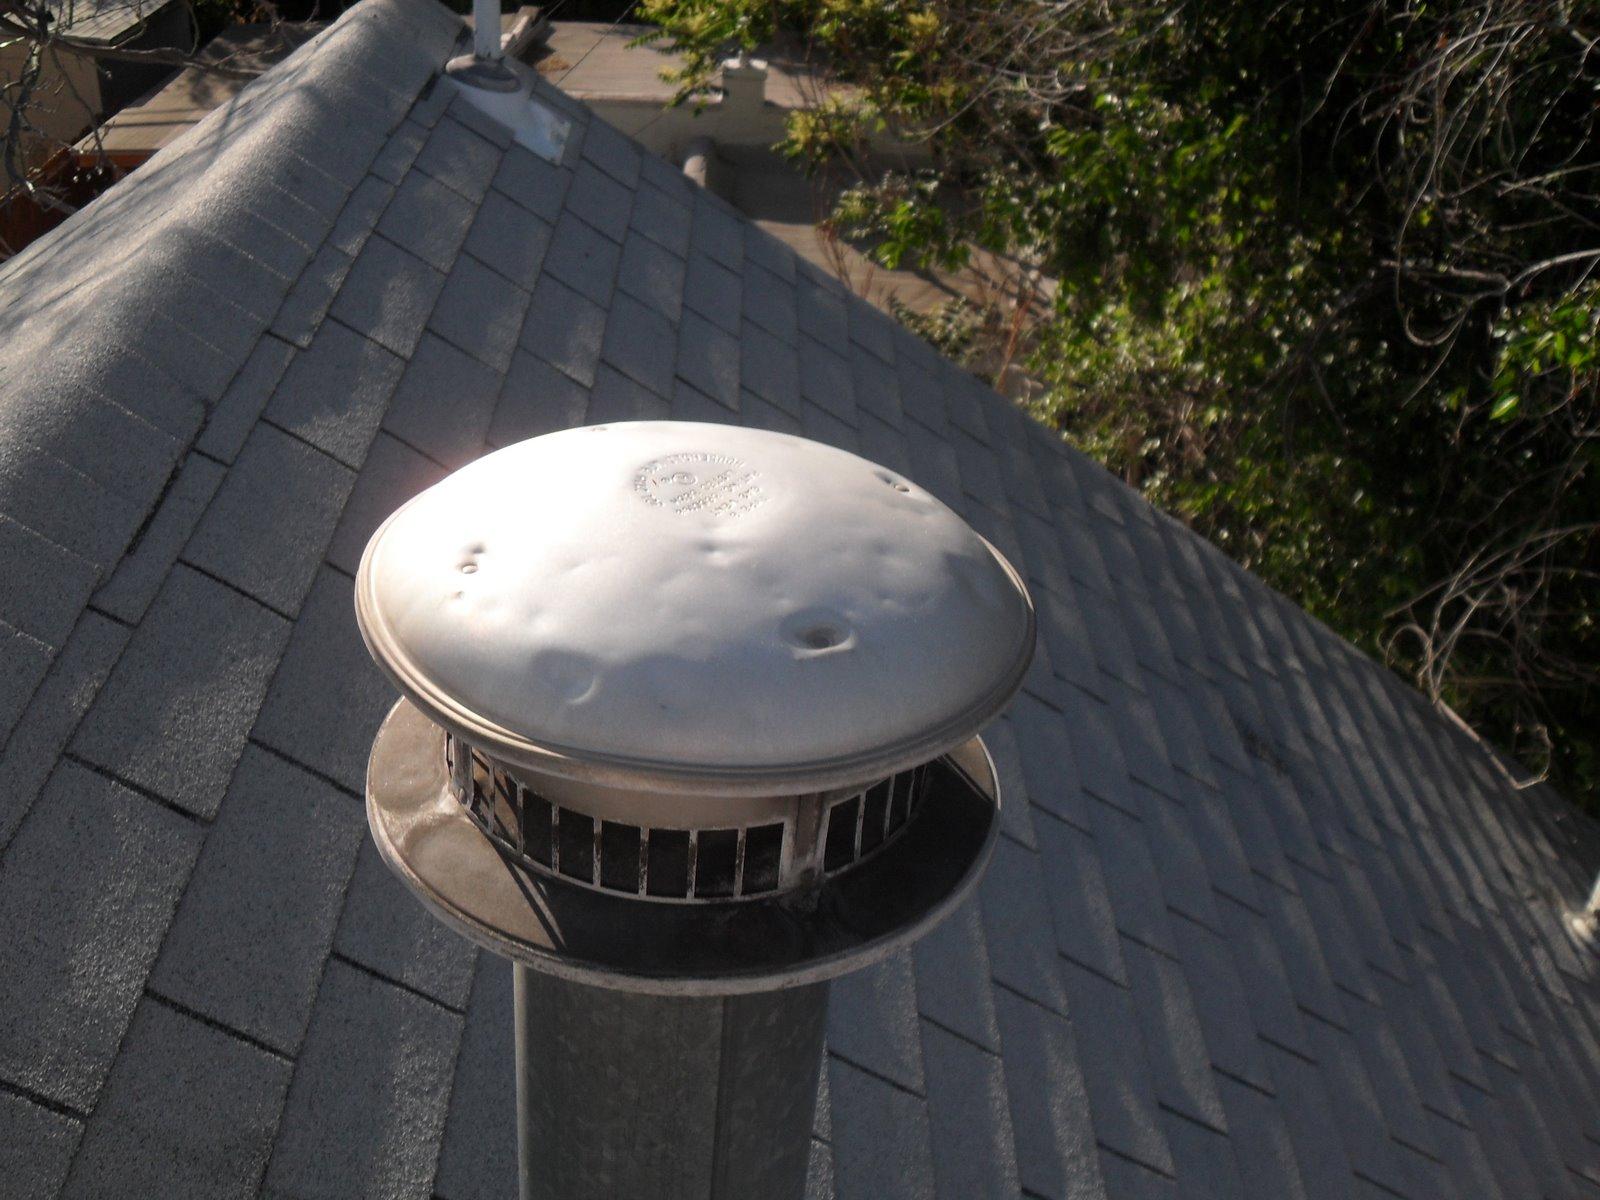 Gas Heater Roof Vent Cap